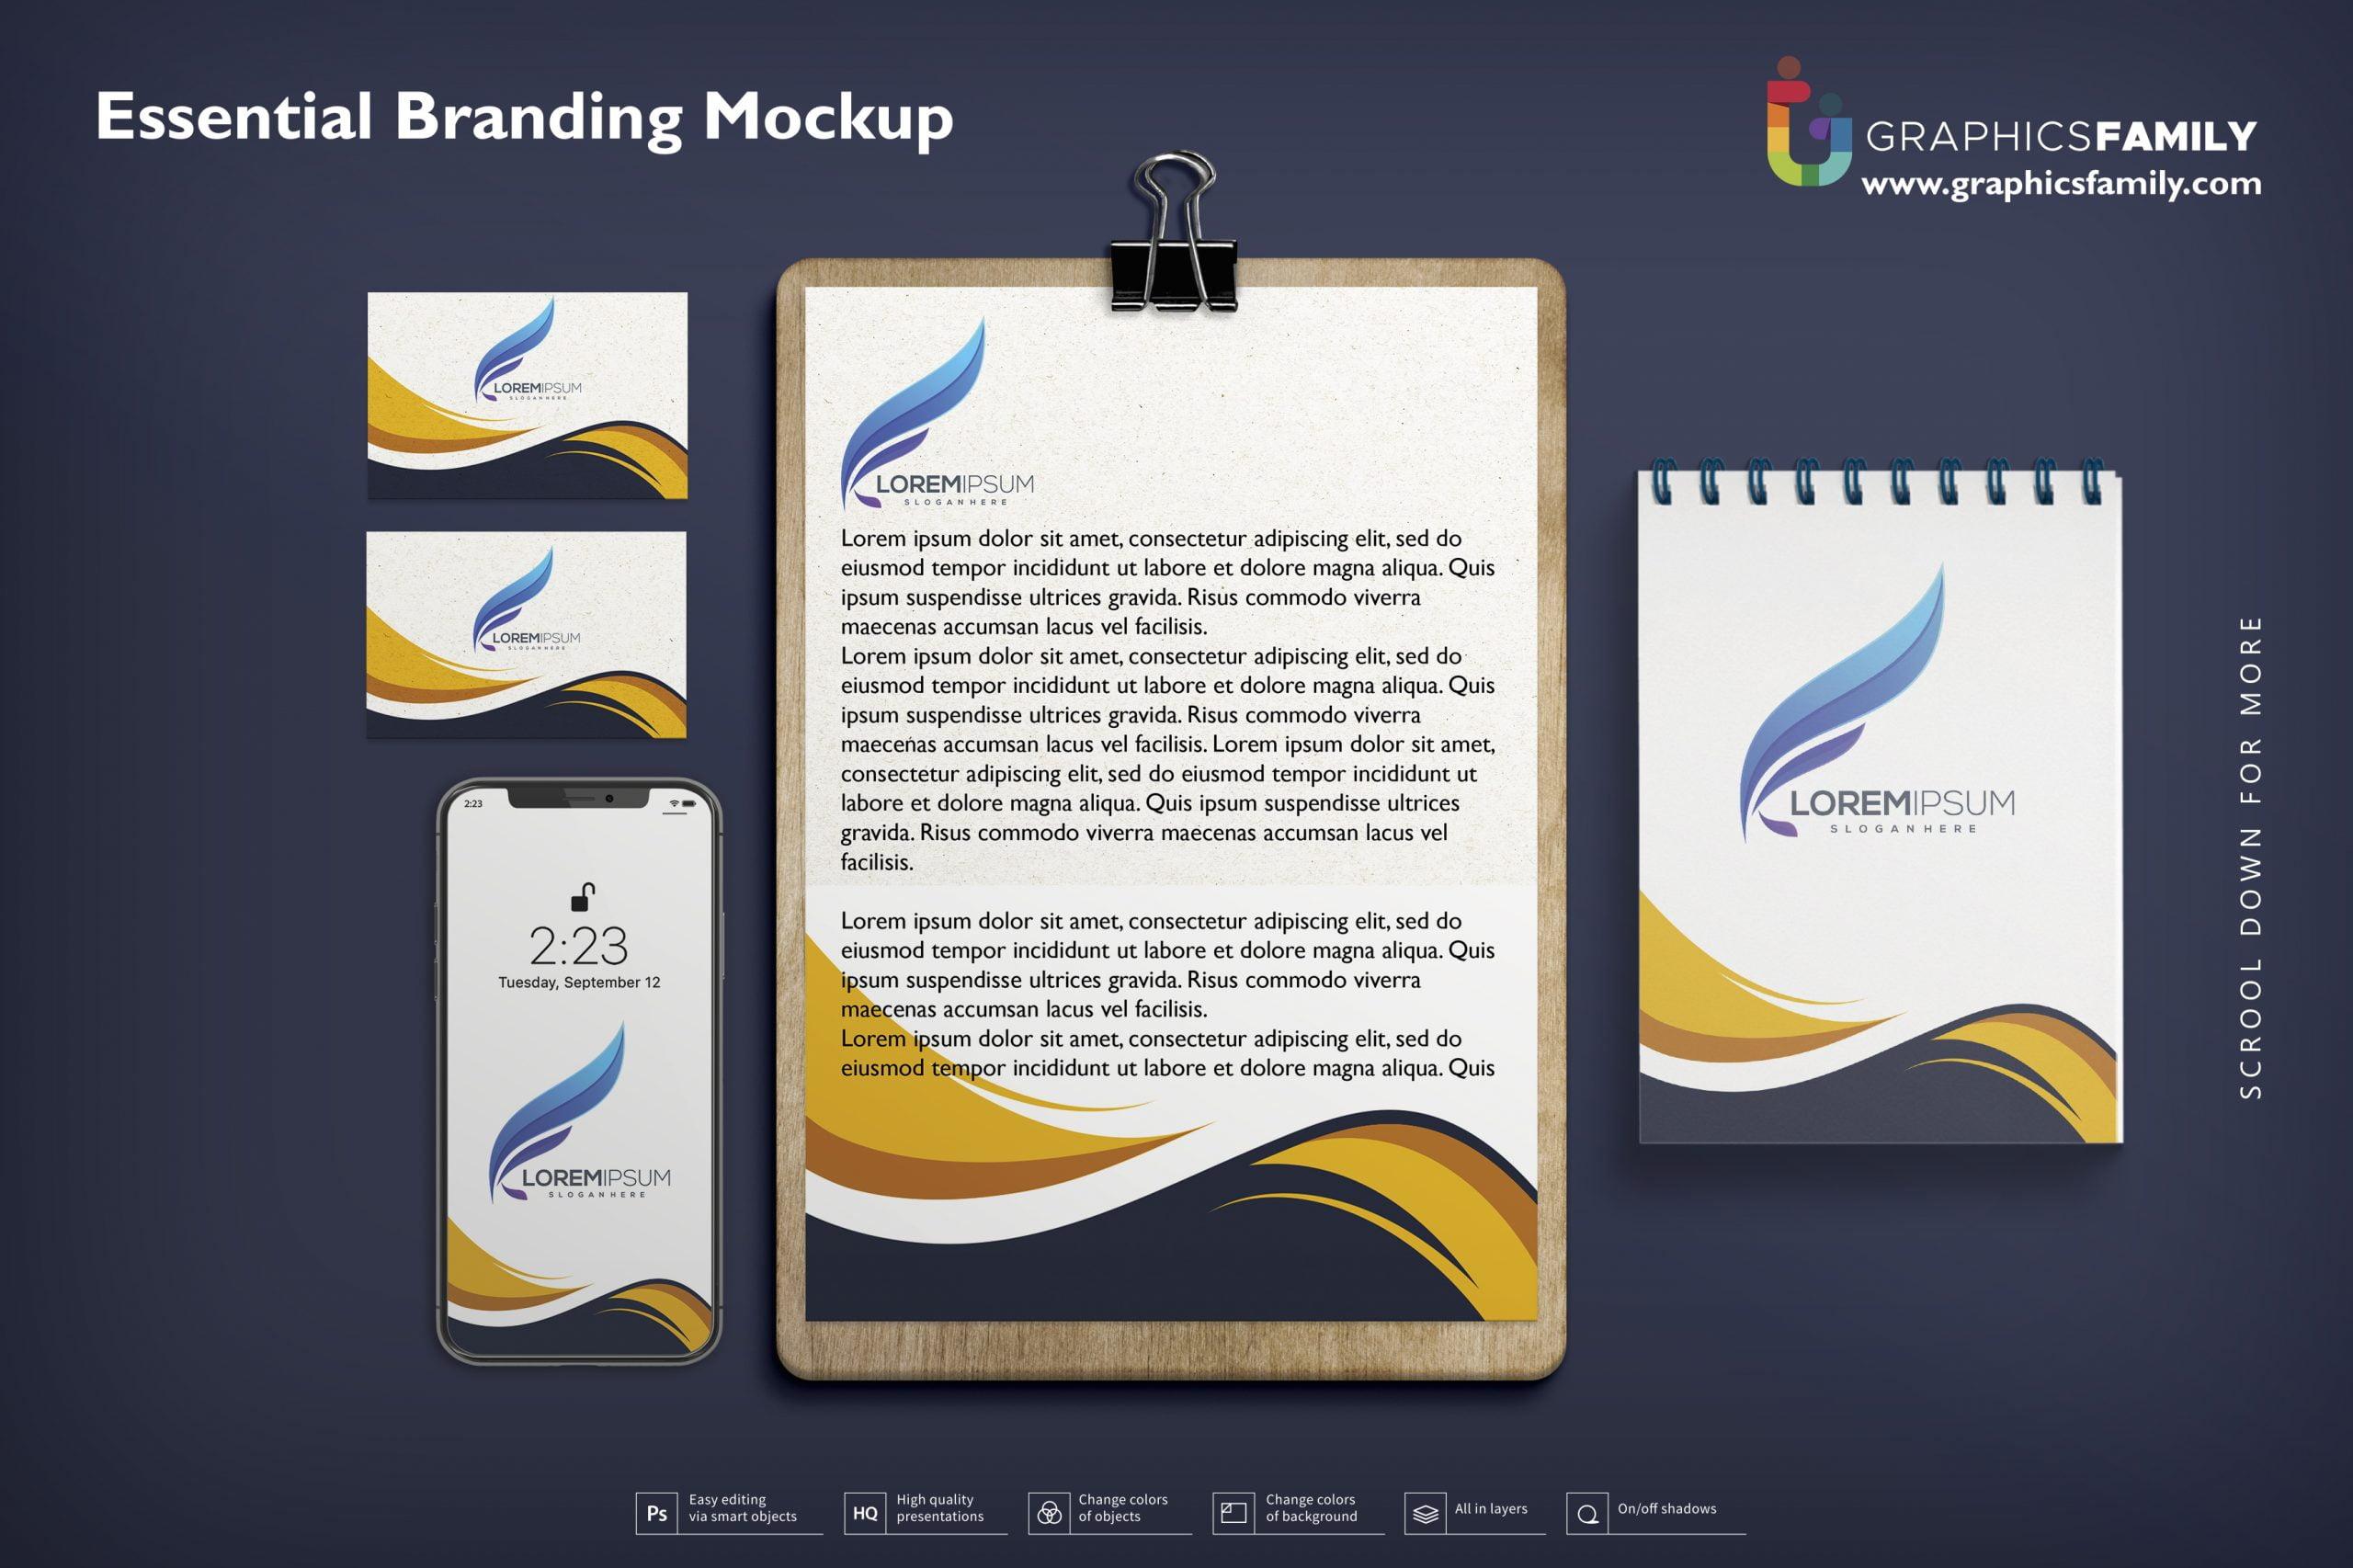 Essential Branding Mockup